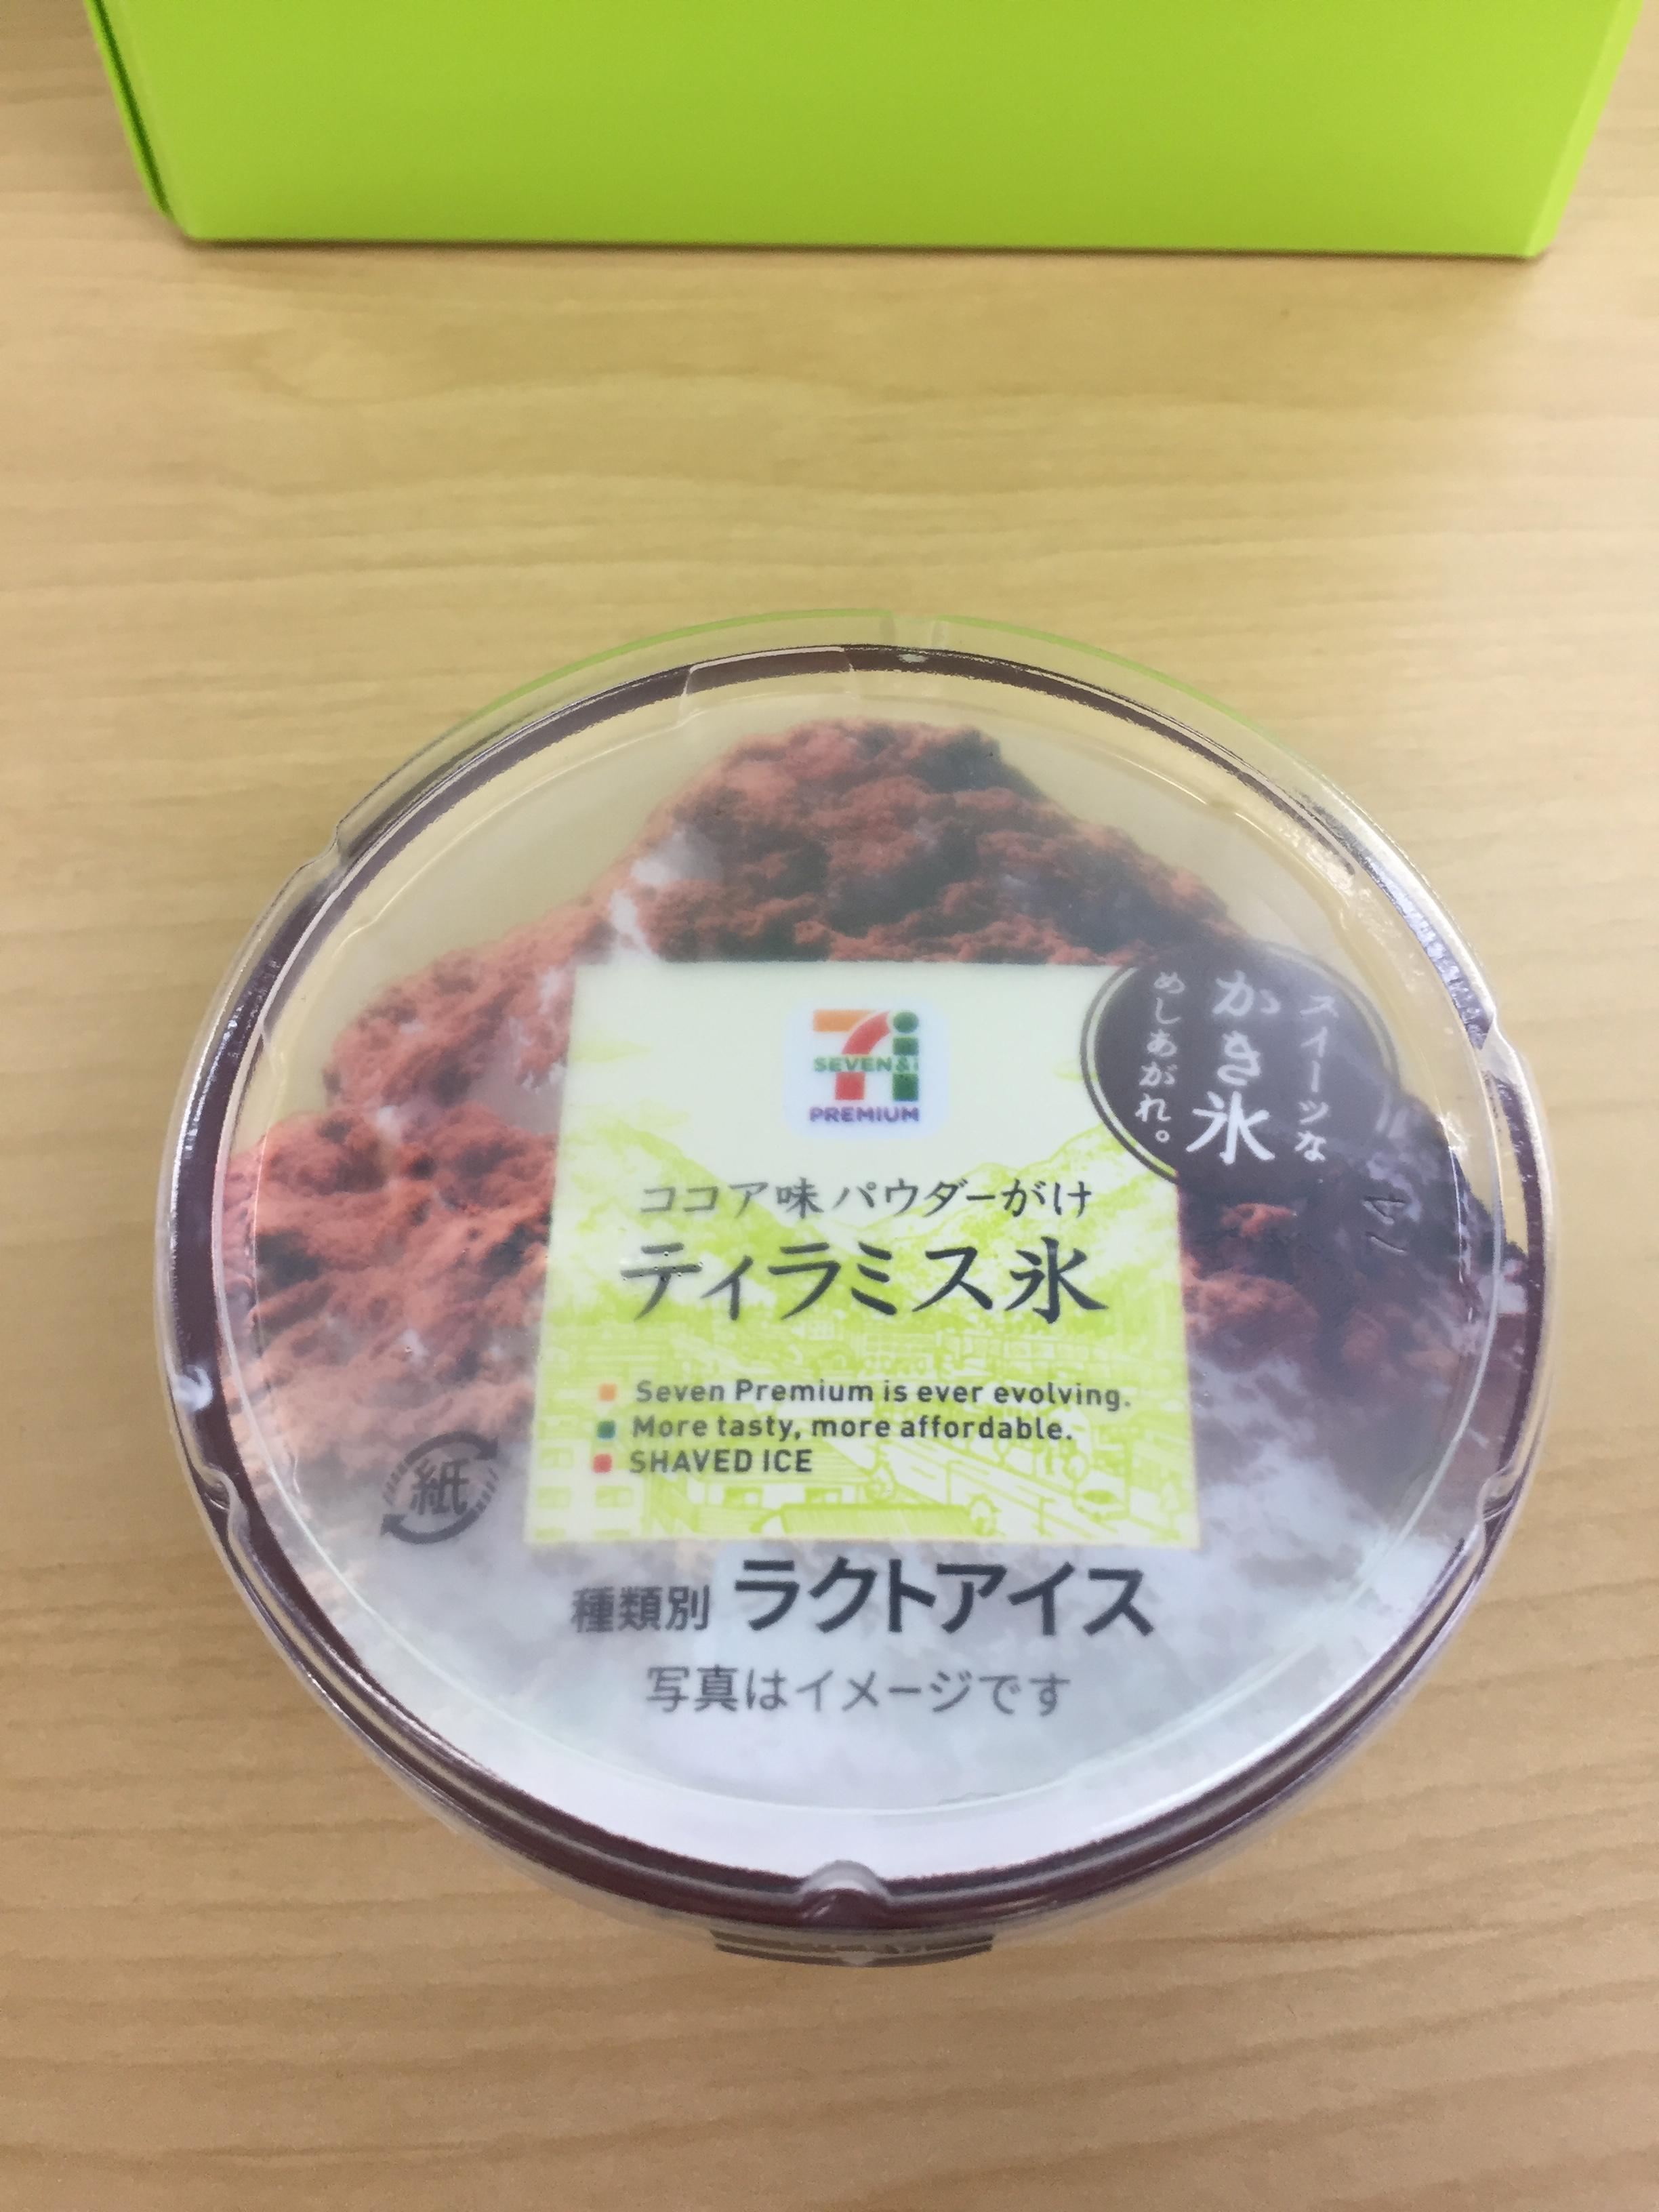 http://www.r-ac.jp/campus/osaka/blog/img/010.JPG